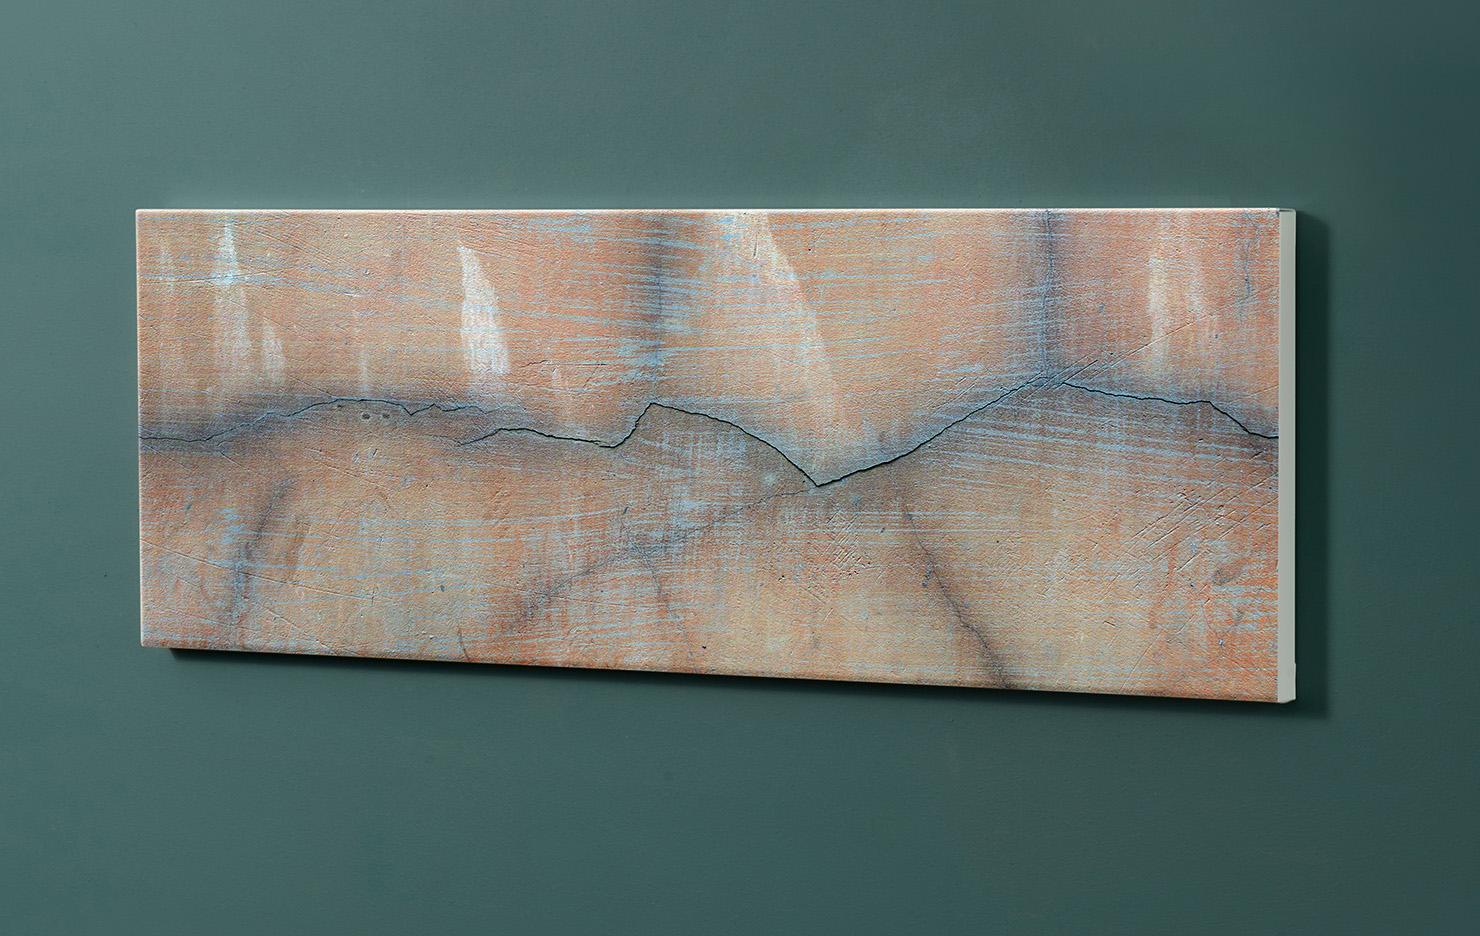 Magnettafel NOTIZ 90x30cm Motiv-Pinnwand M104 Mamor